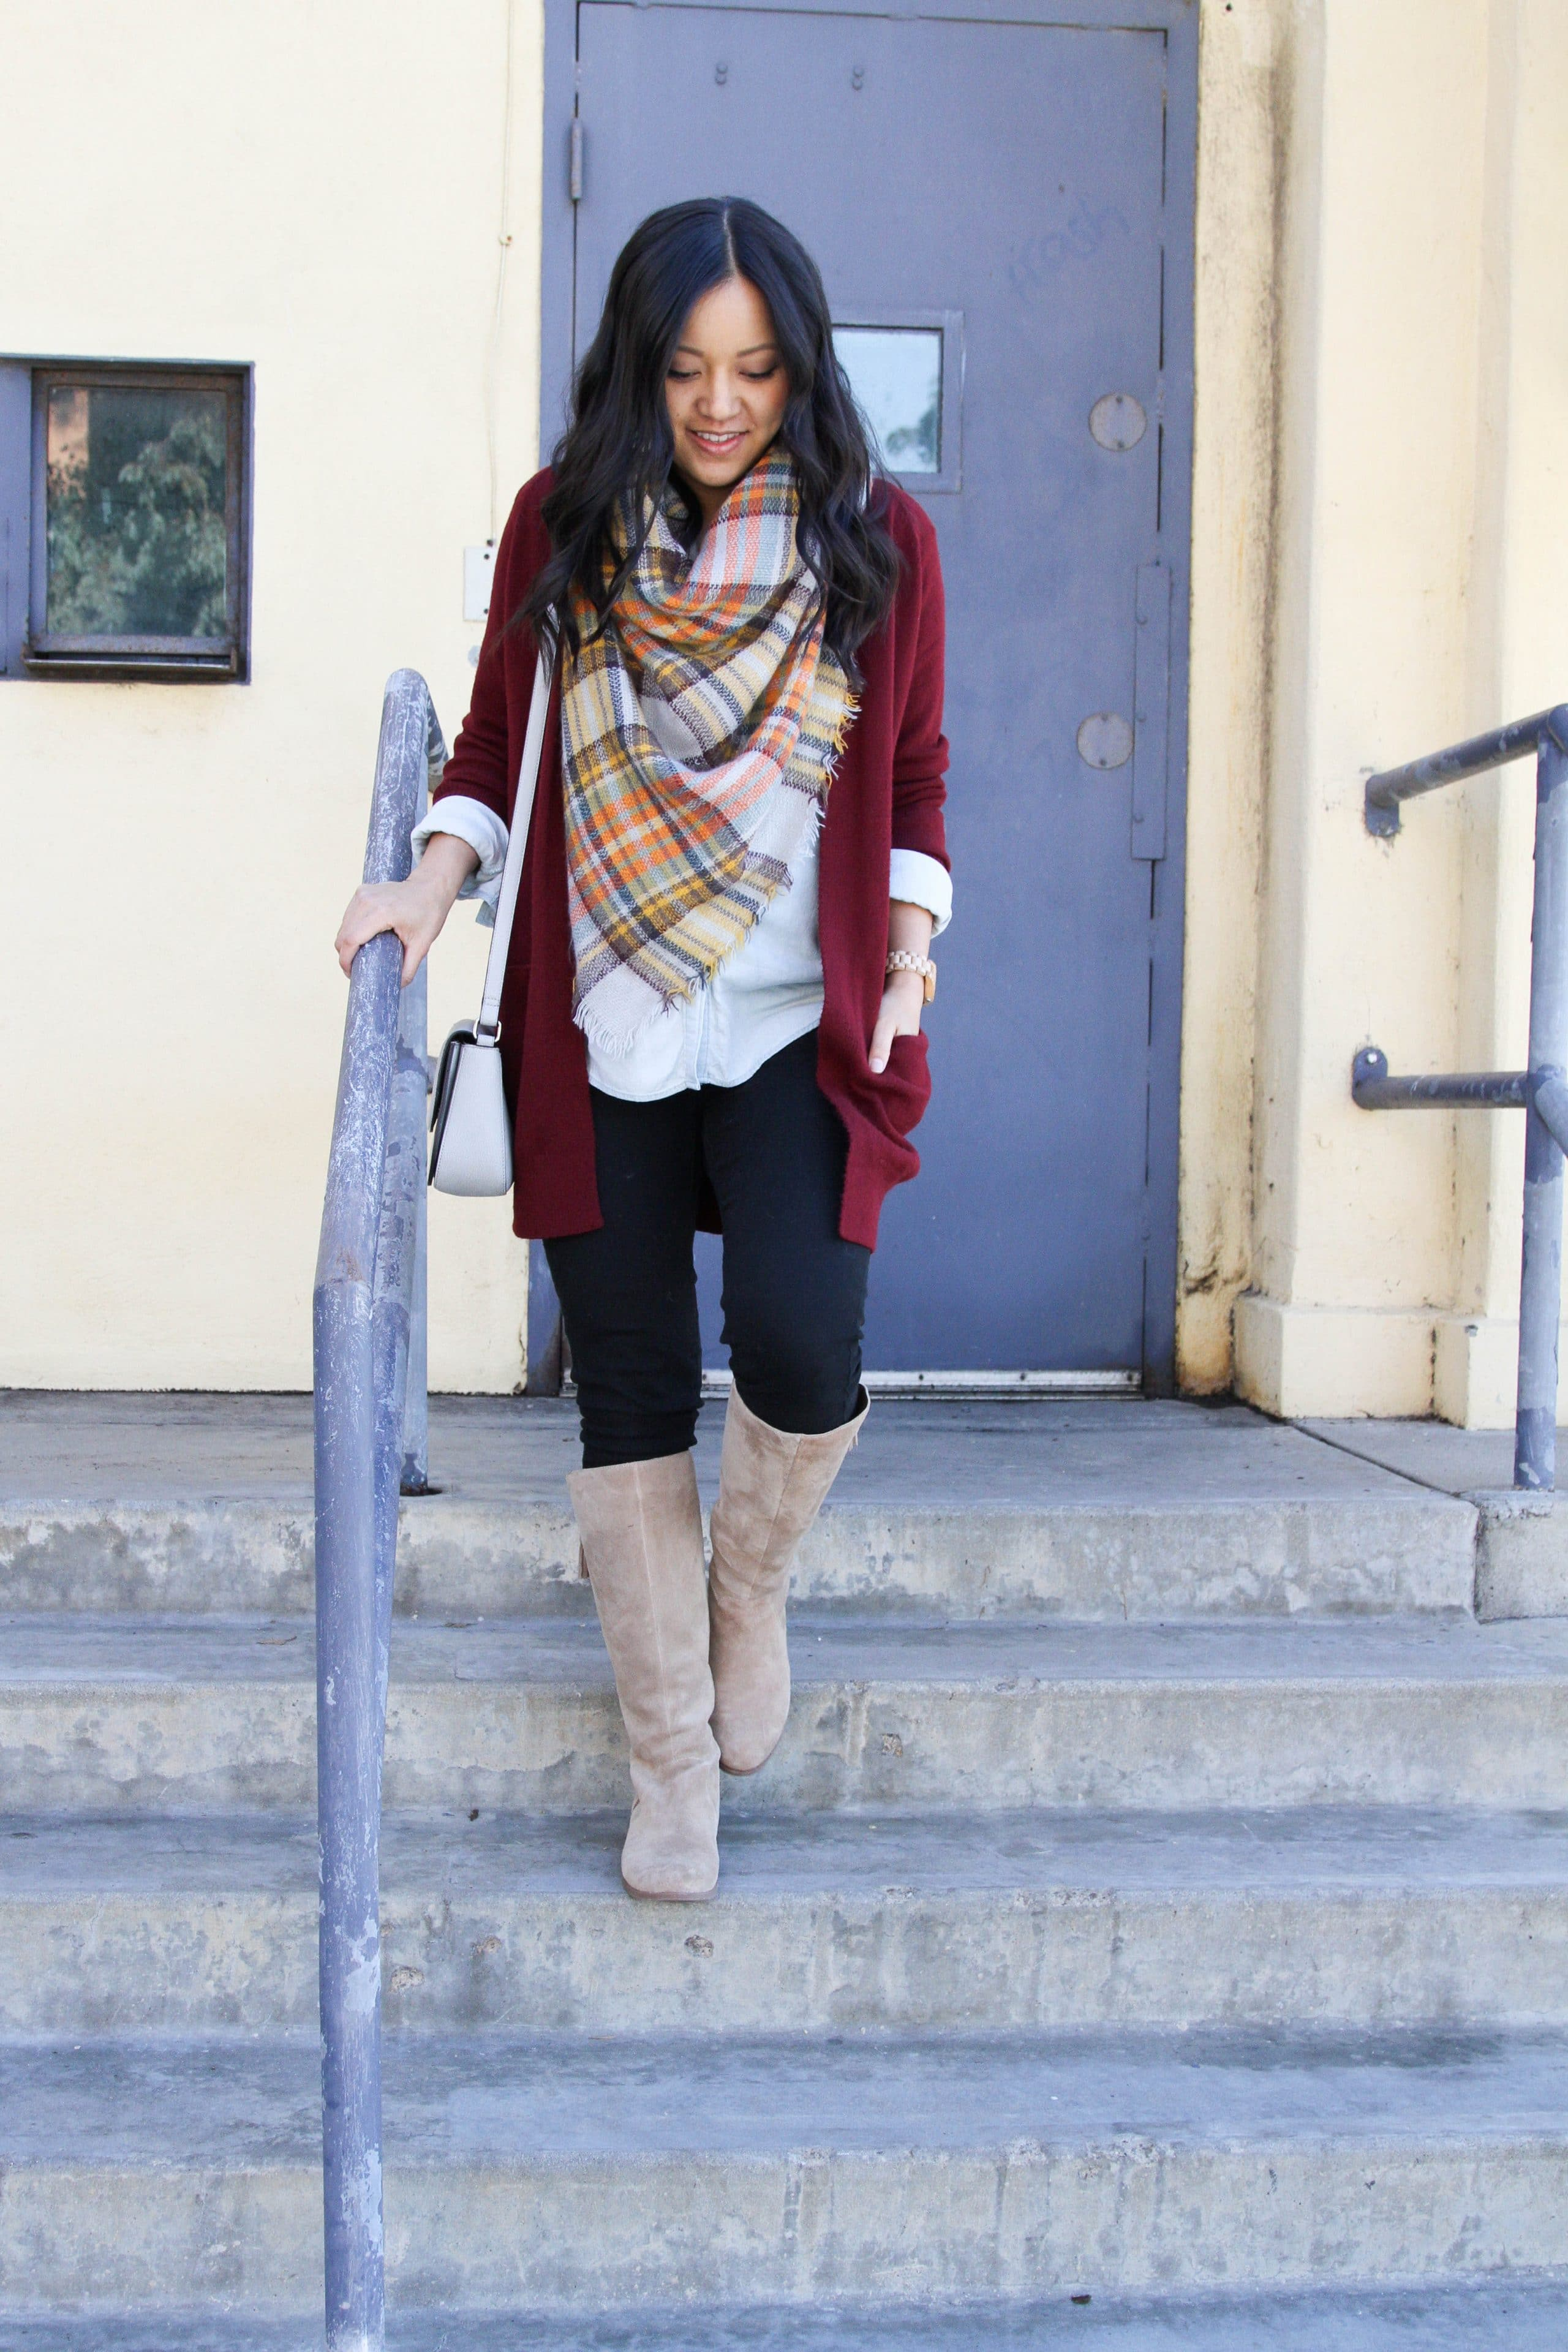 2b776de5b8 ... Black Skinnies + white bag + boots Blanket scarf + maroon cardigan + white  blouse + skinnies + boots ...